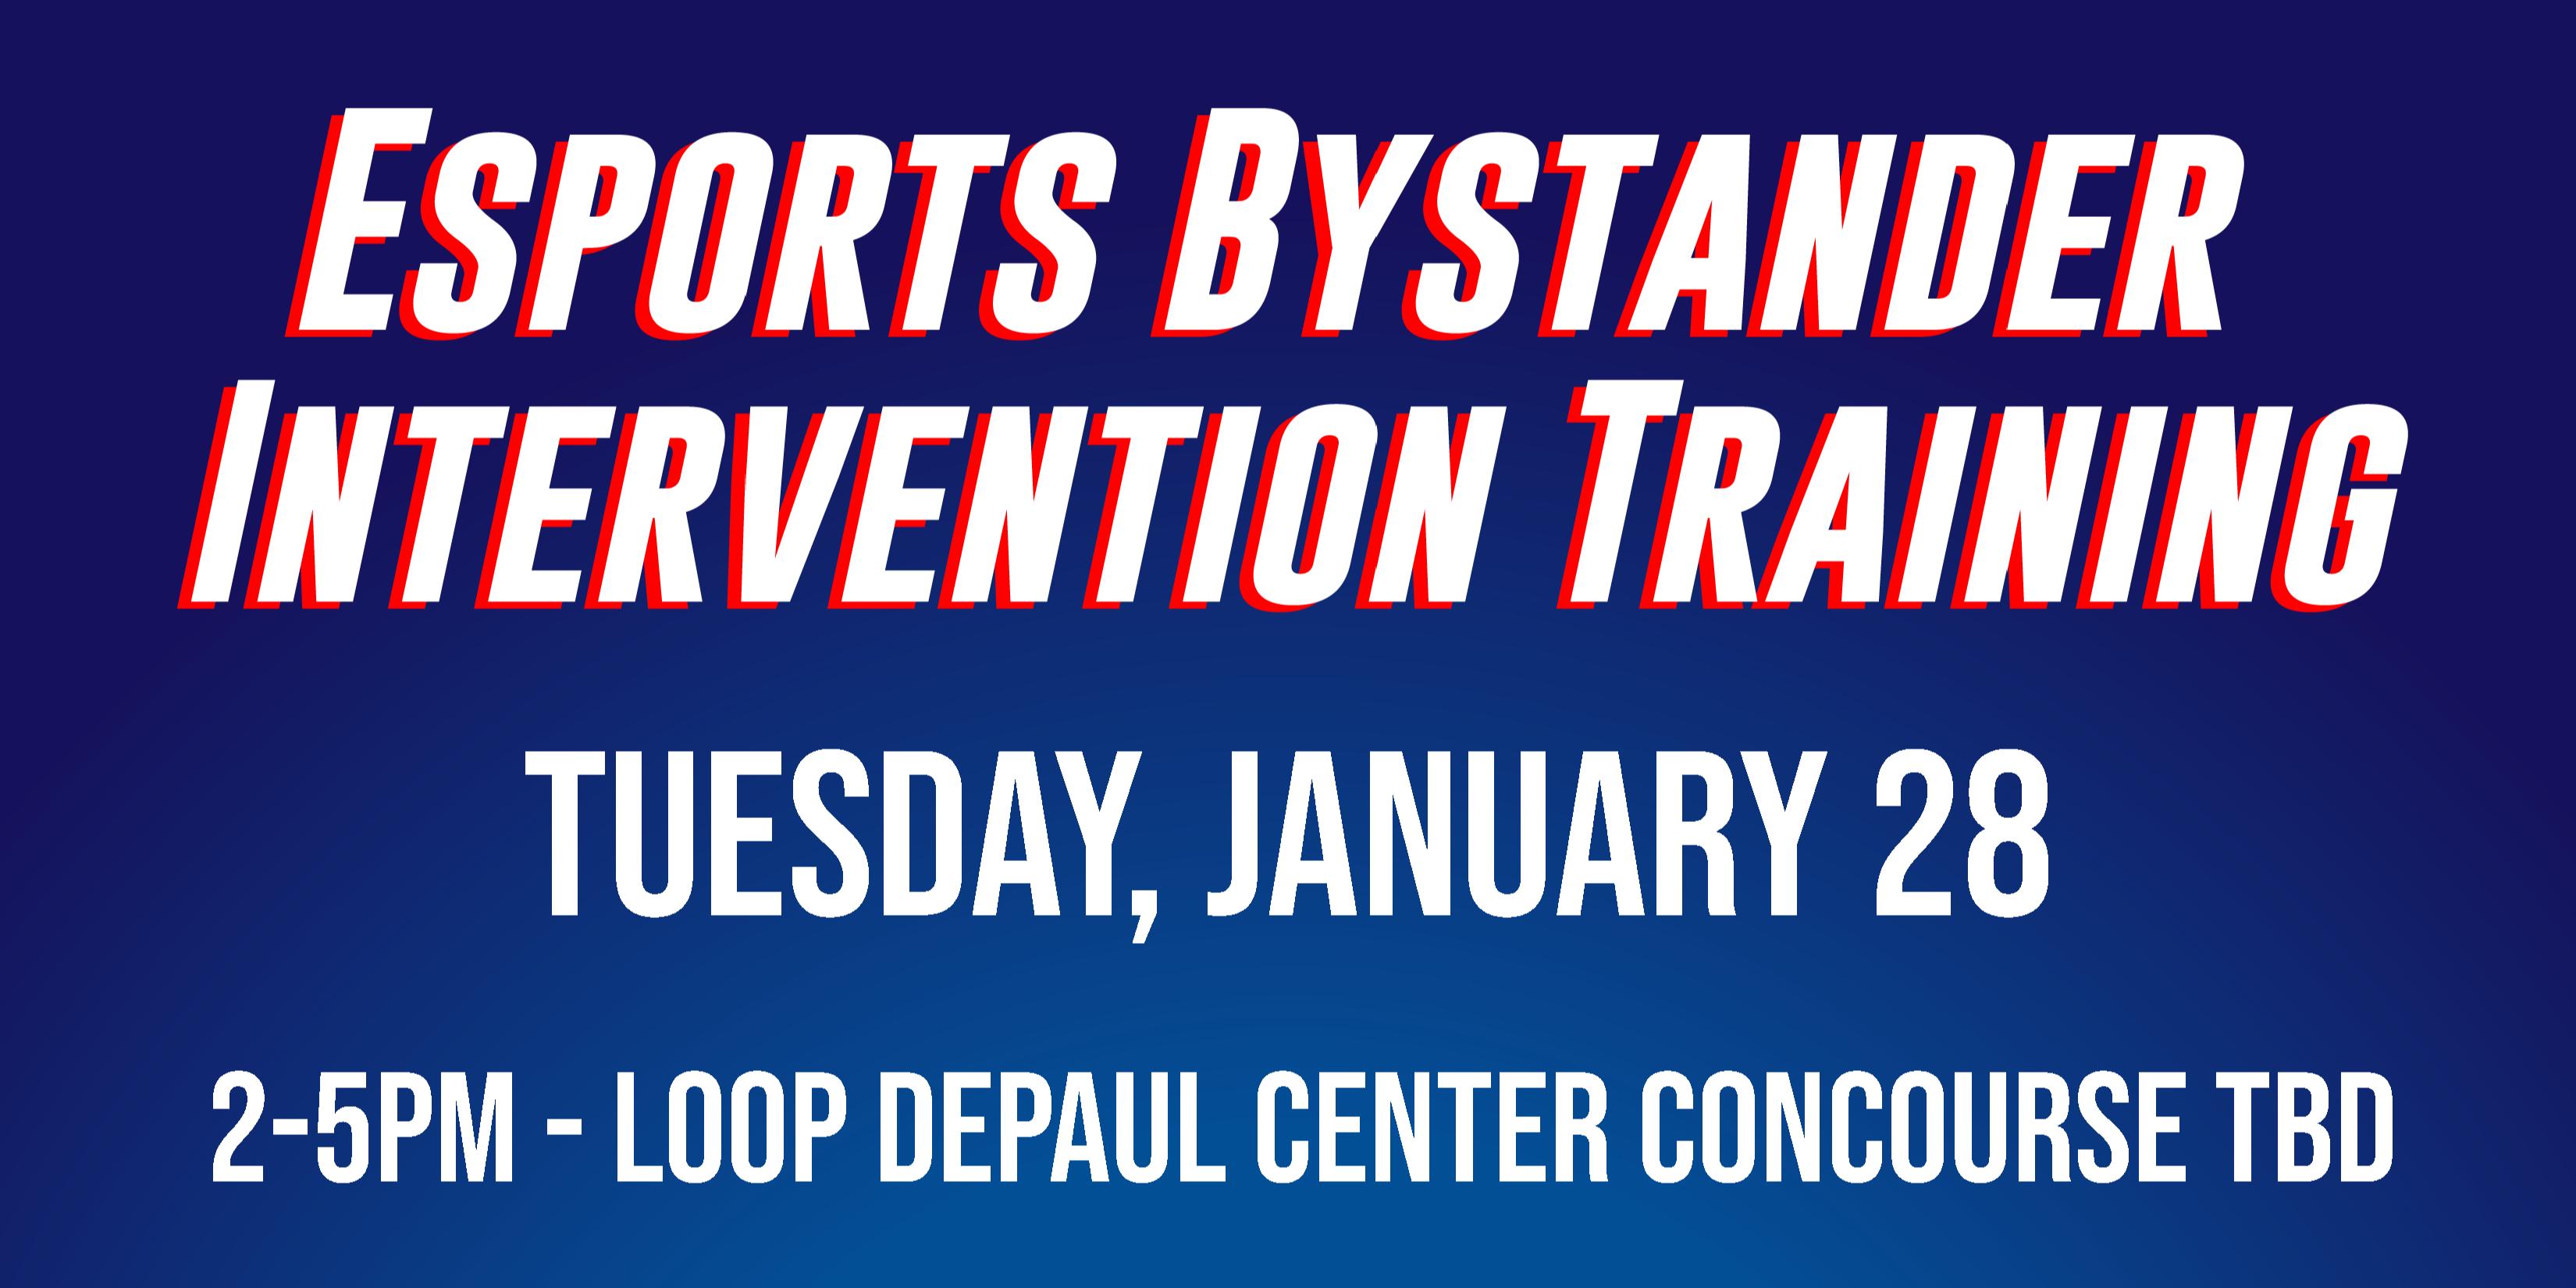 Esports Community Bystander Intervention Training